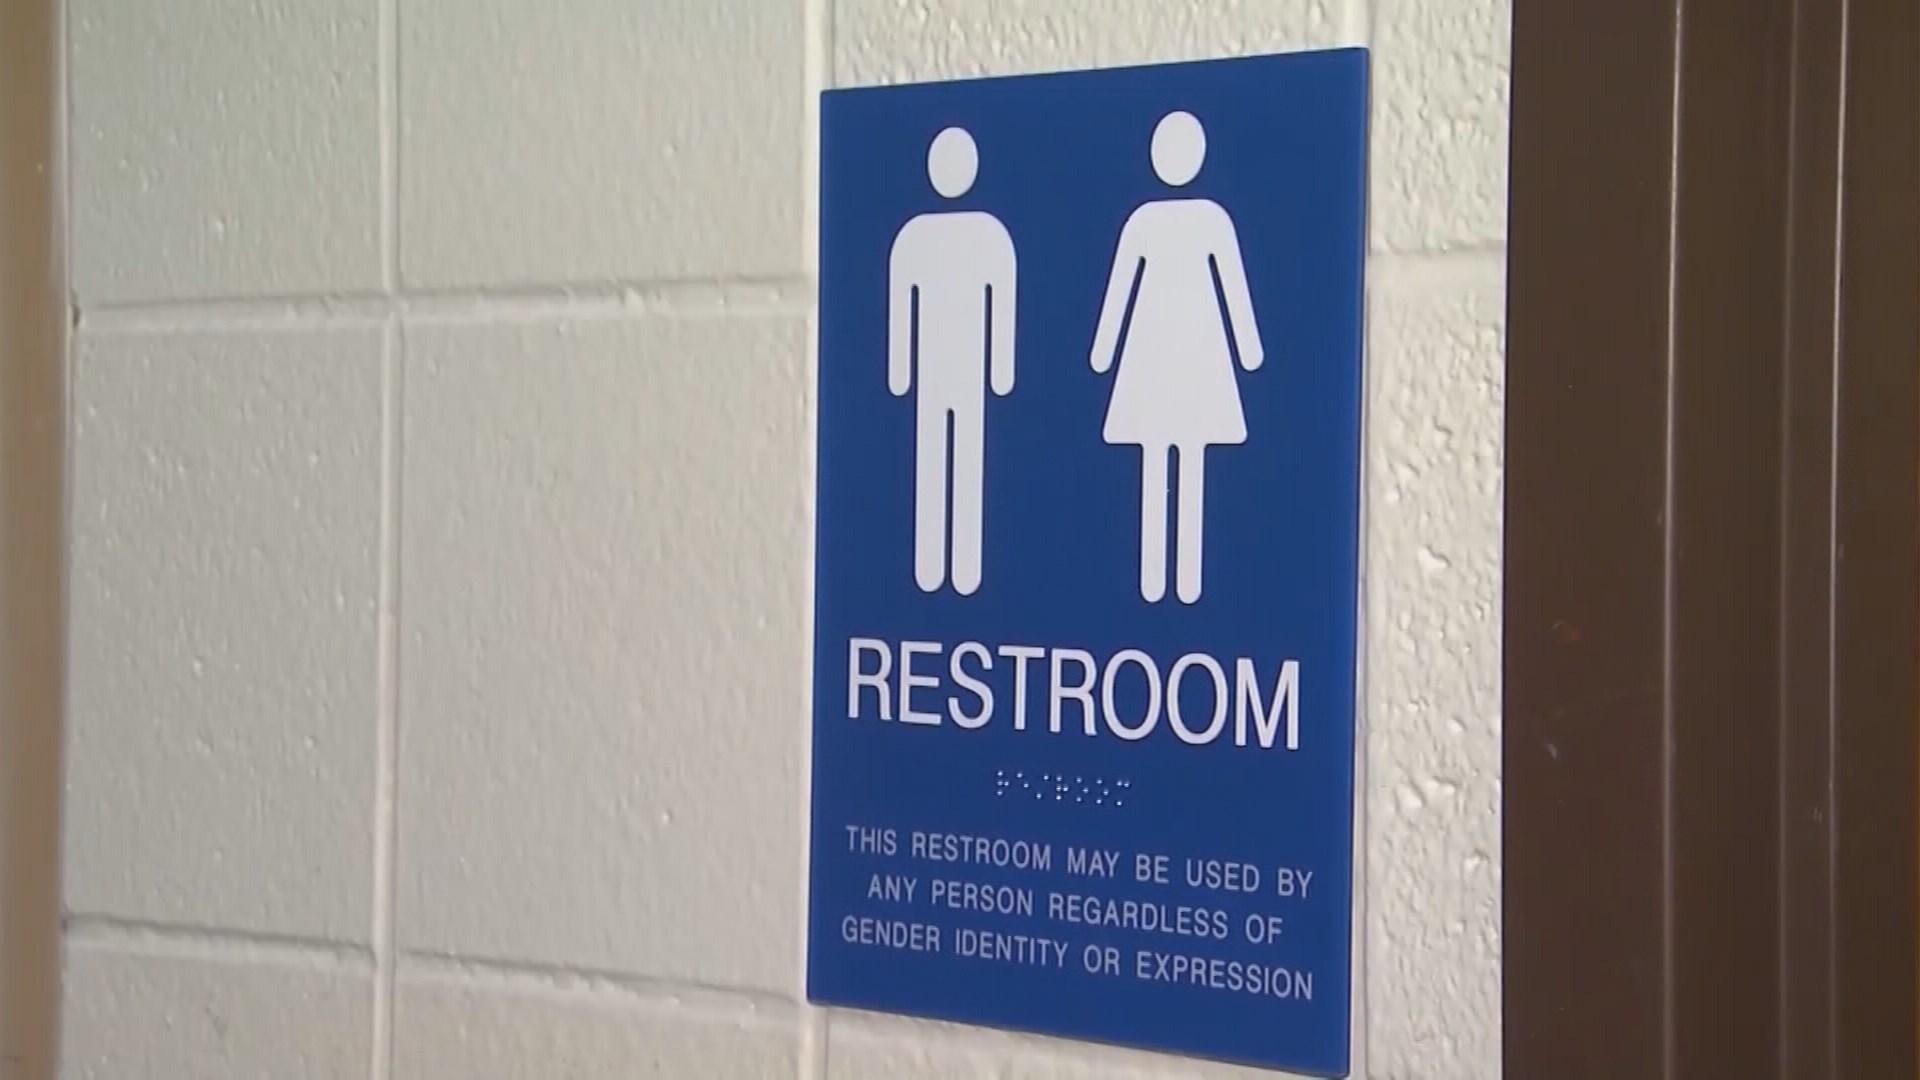 Bathroom bill clears Texas Senate but still faces hurdles